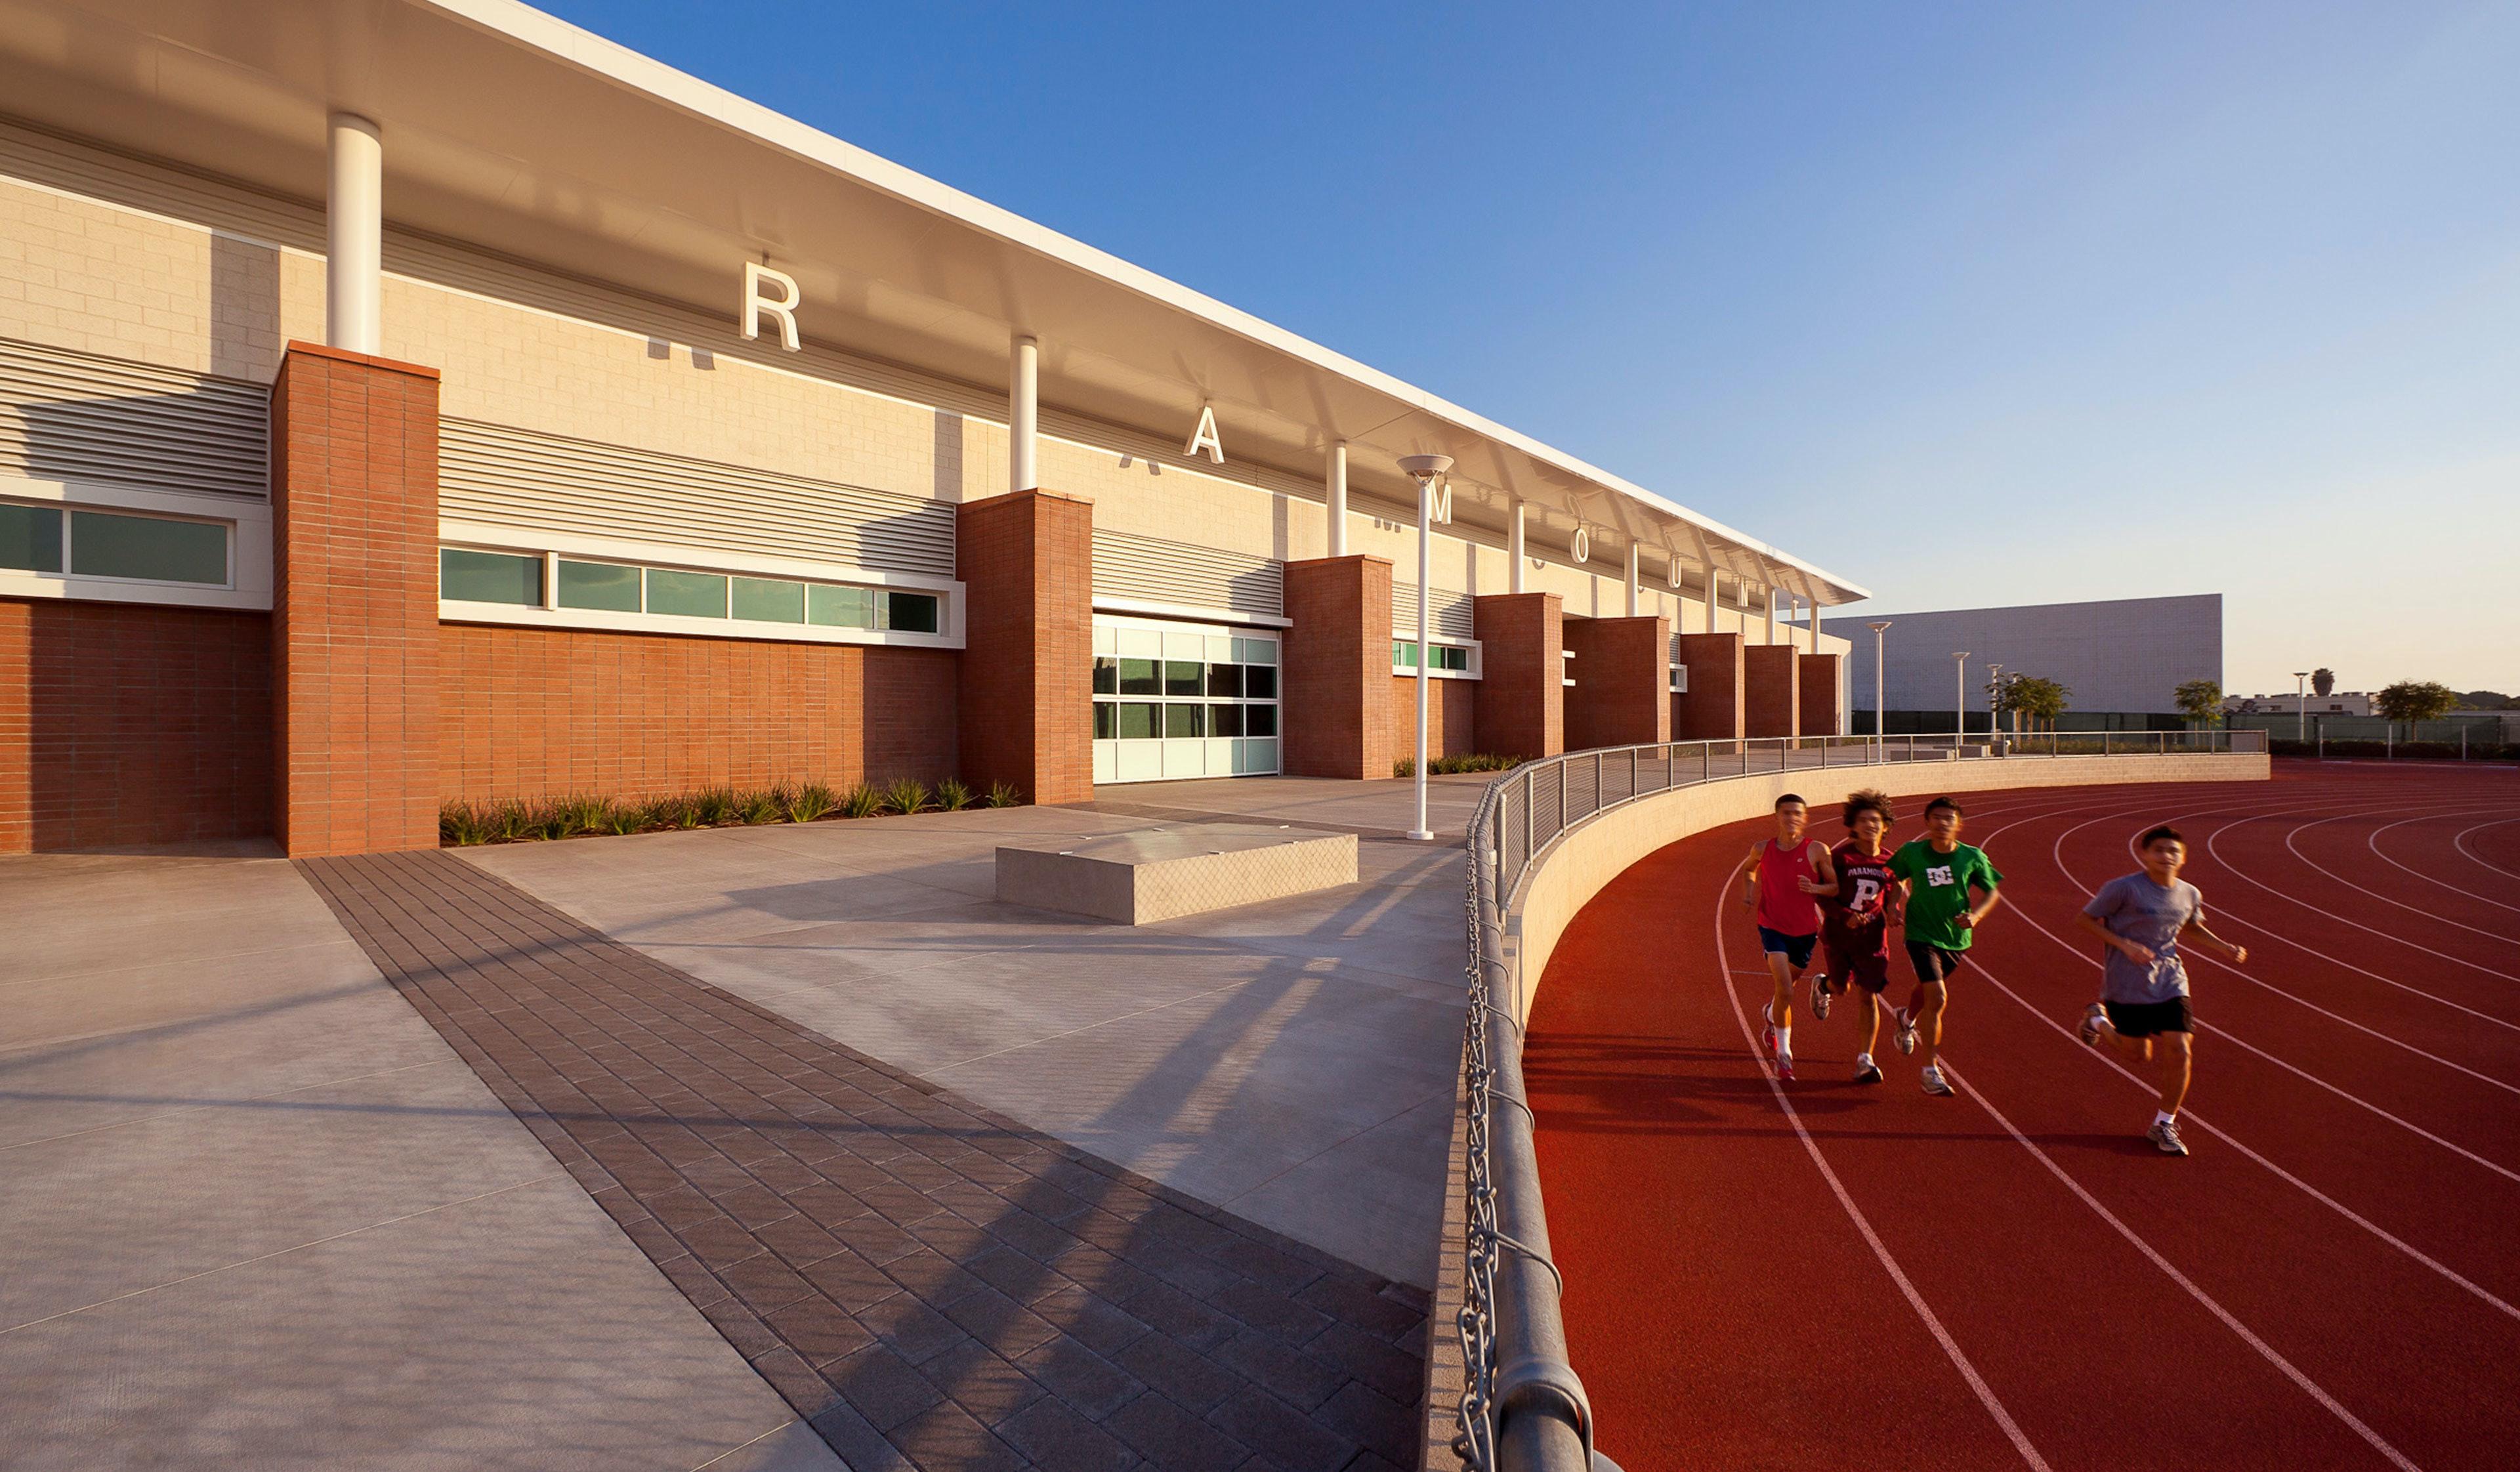 Paramount Hs Athletic Complex2